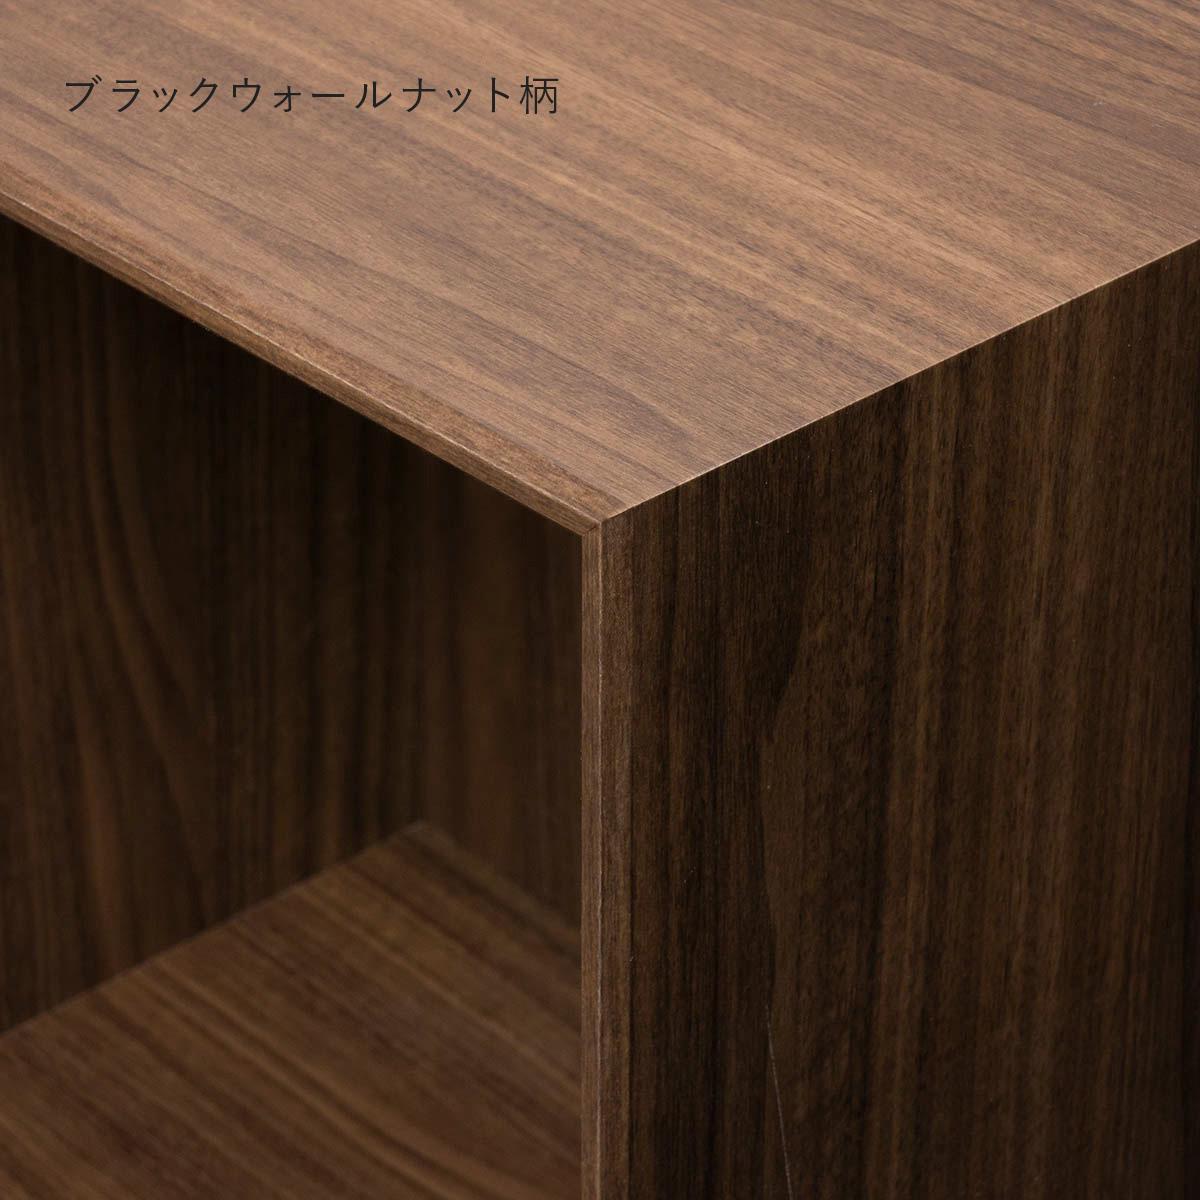 【 V-TISS LIGHT #010 】 水平のラインを強調する細長い棚